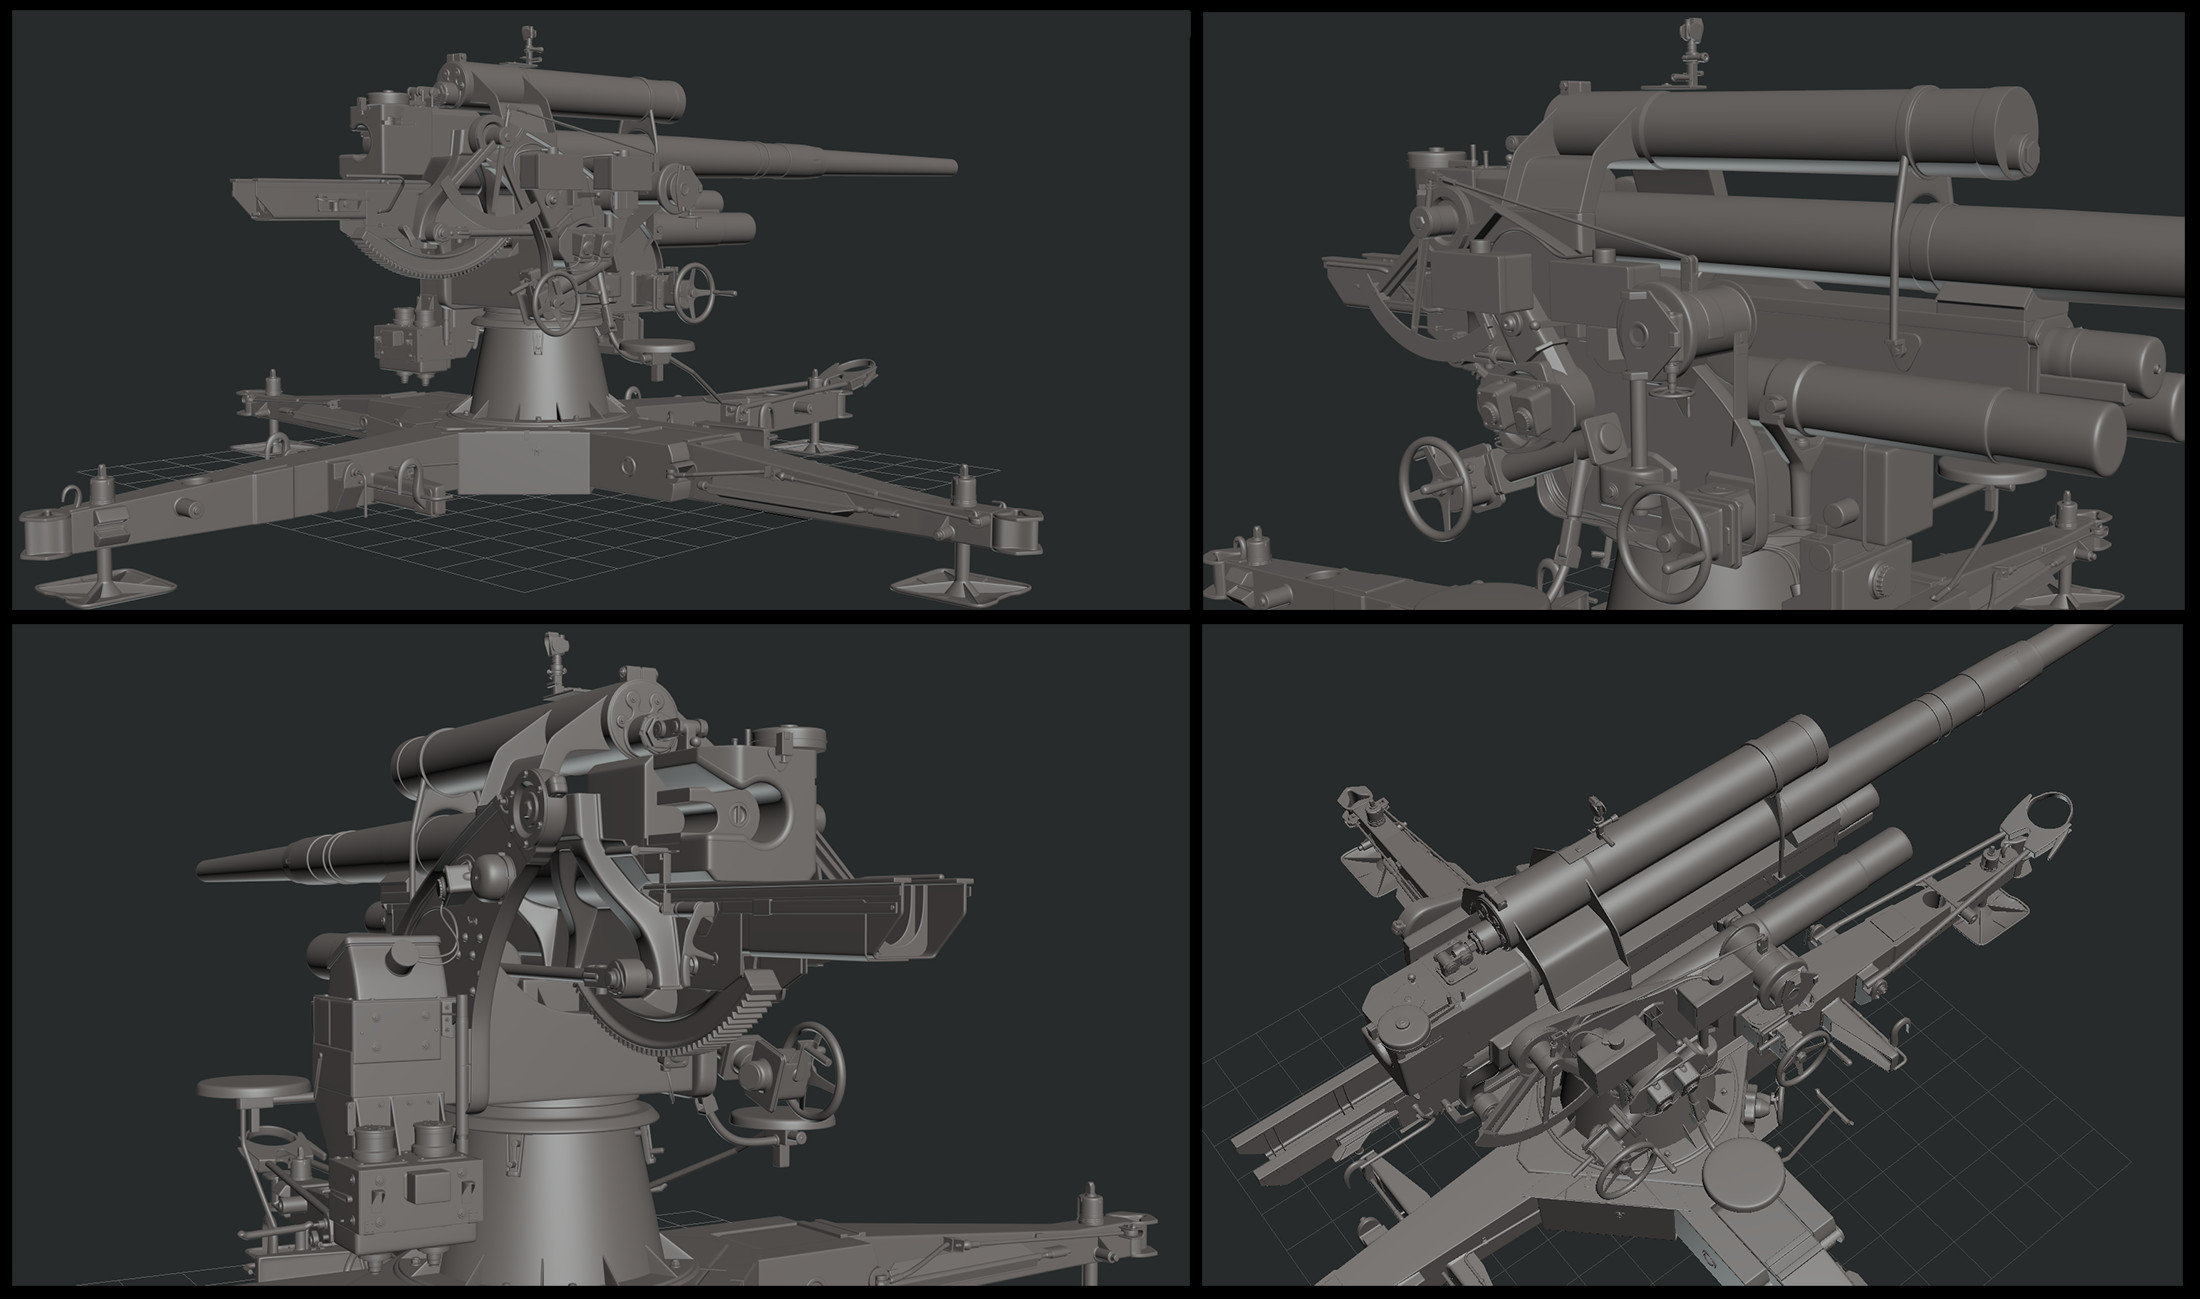 Cannon 88mm Flak 36